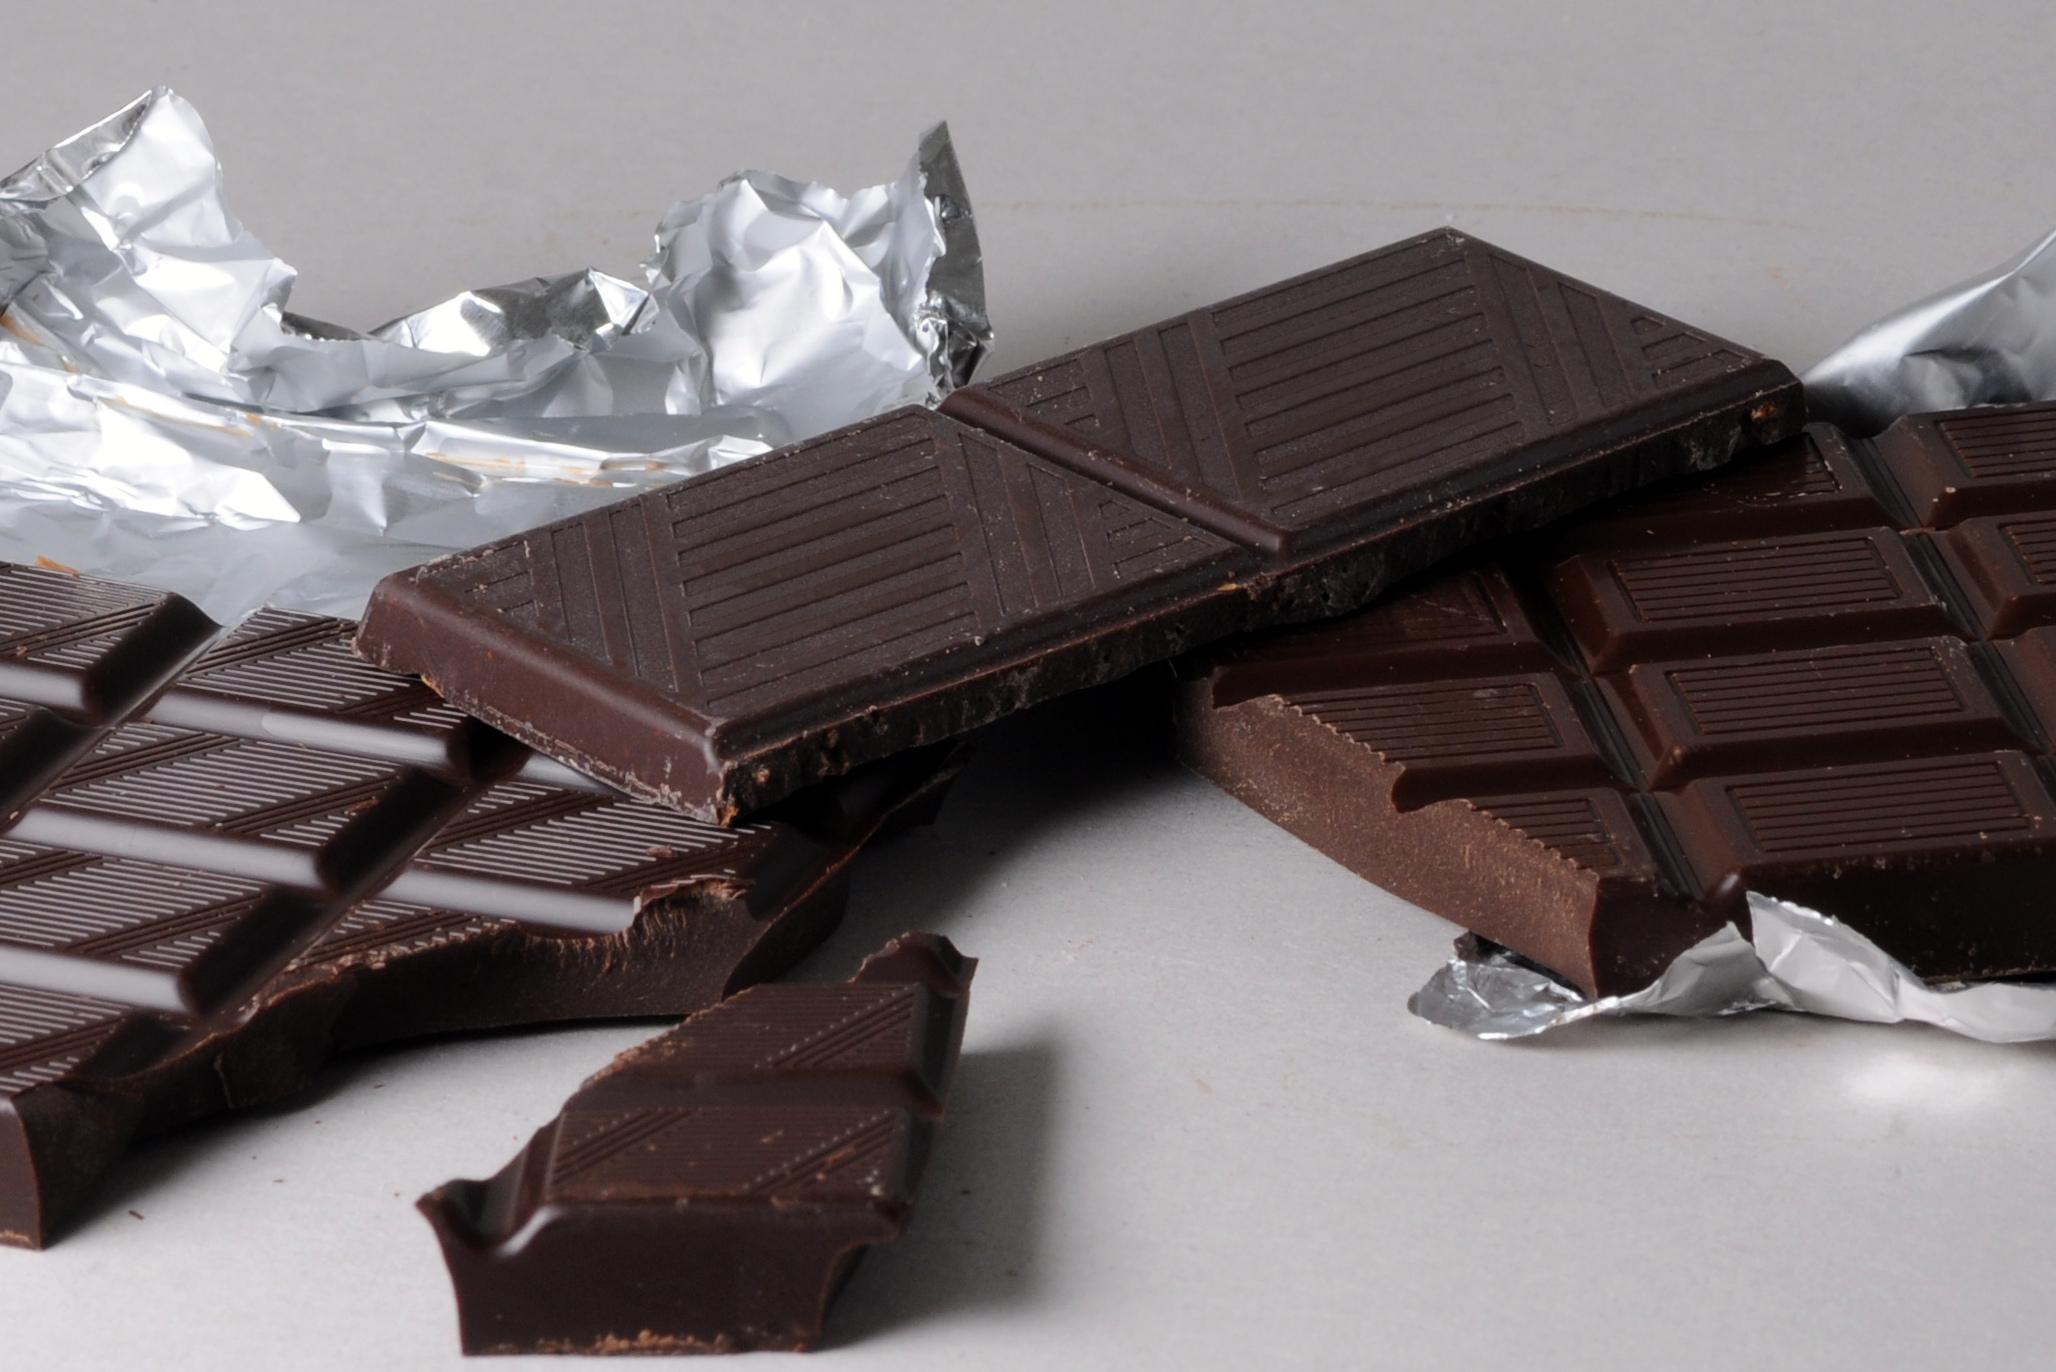 Eating dark chocolate cuts stress, boosts memory: Study